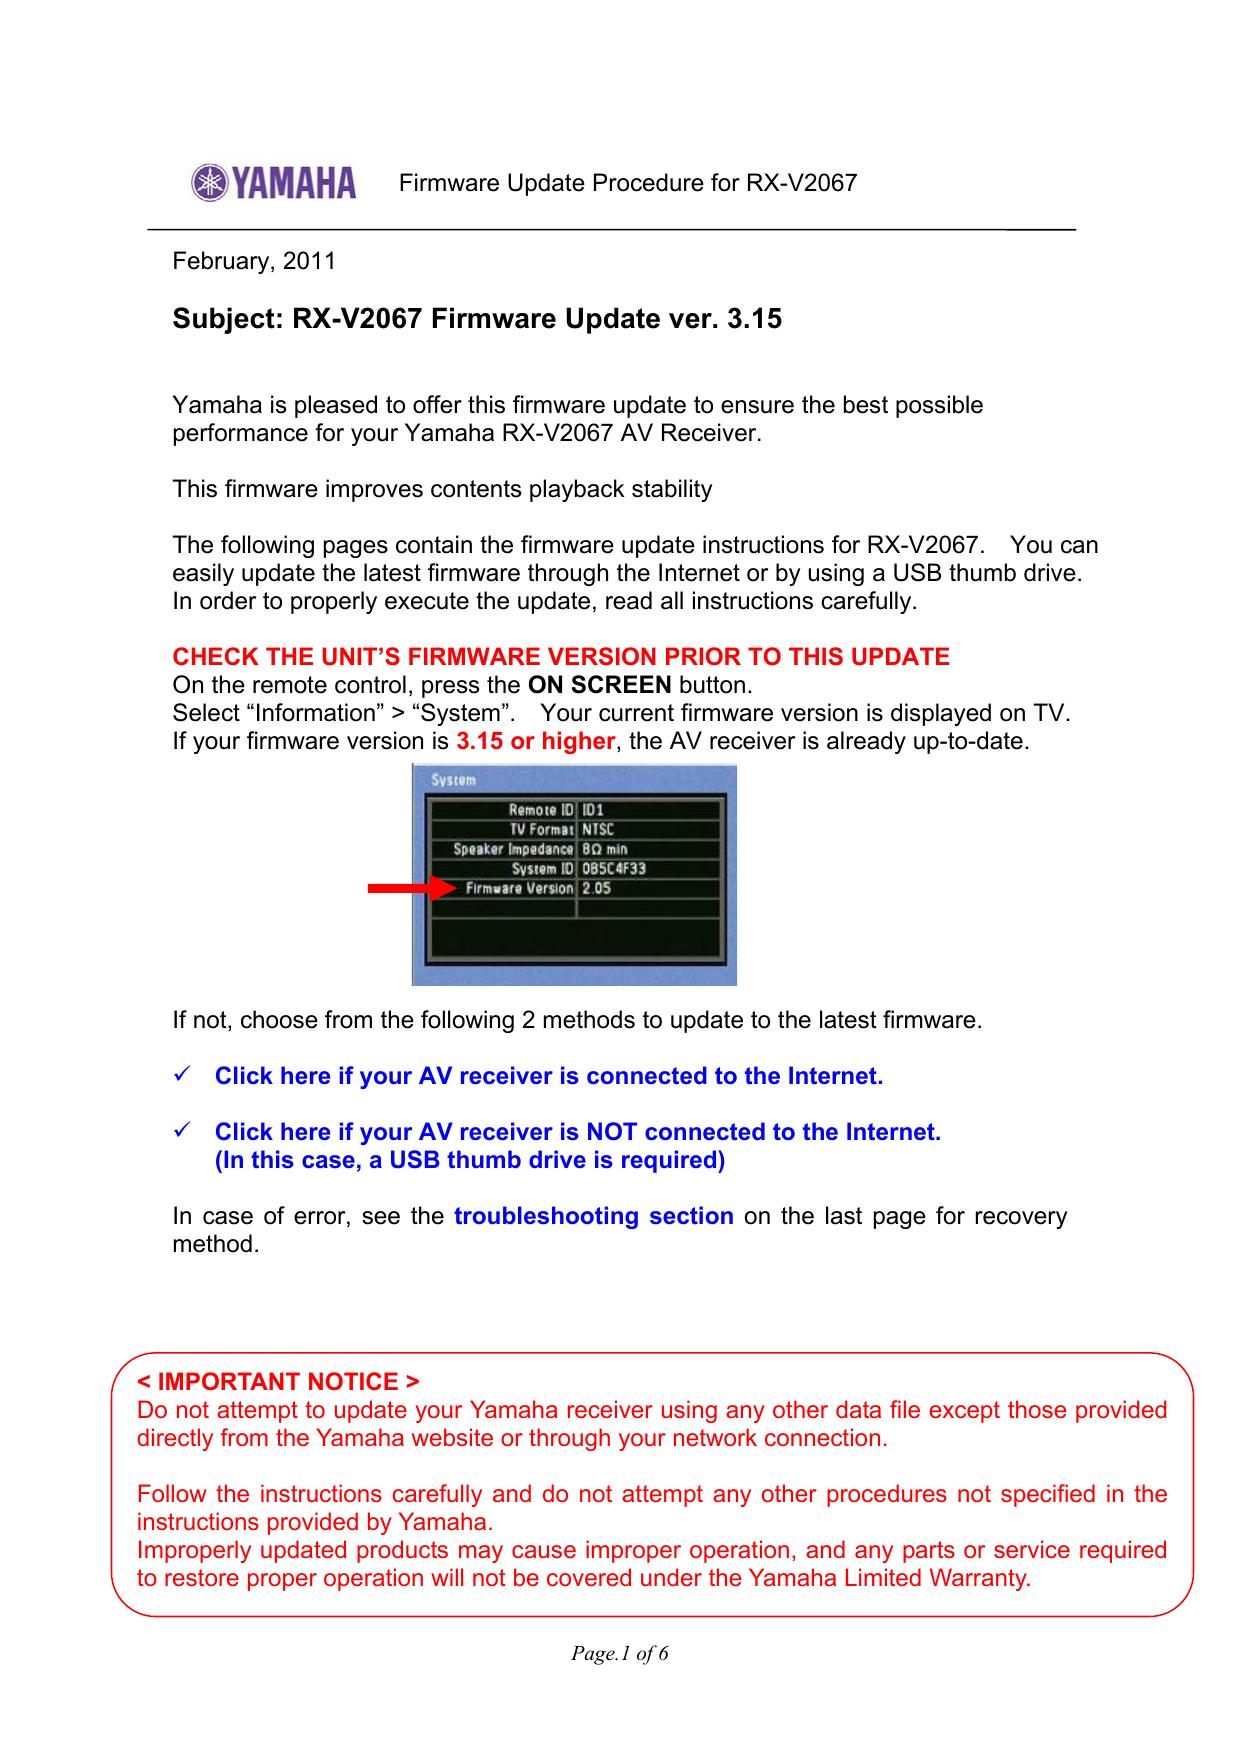 Yamaha RX-V2067 Firmware Update ver  3 15